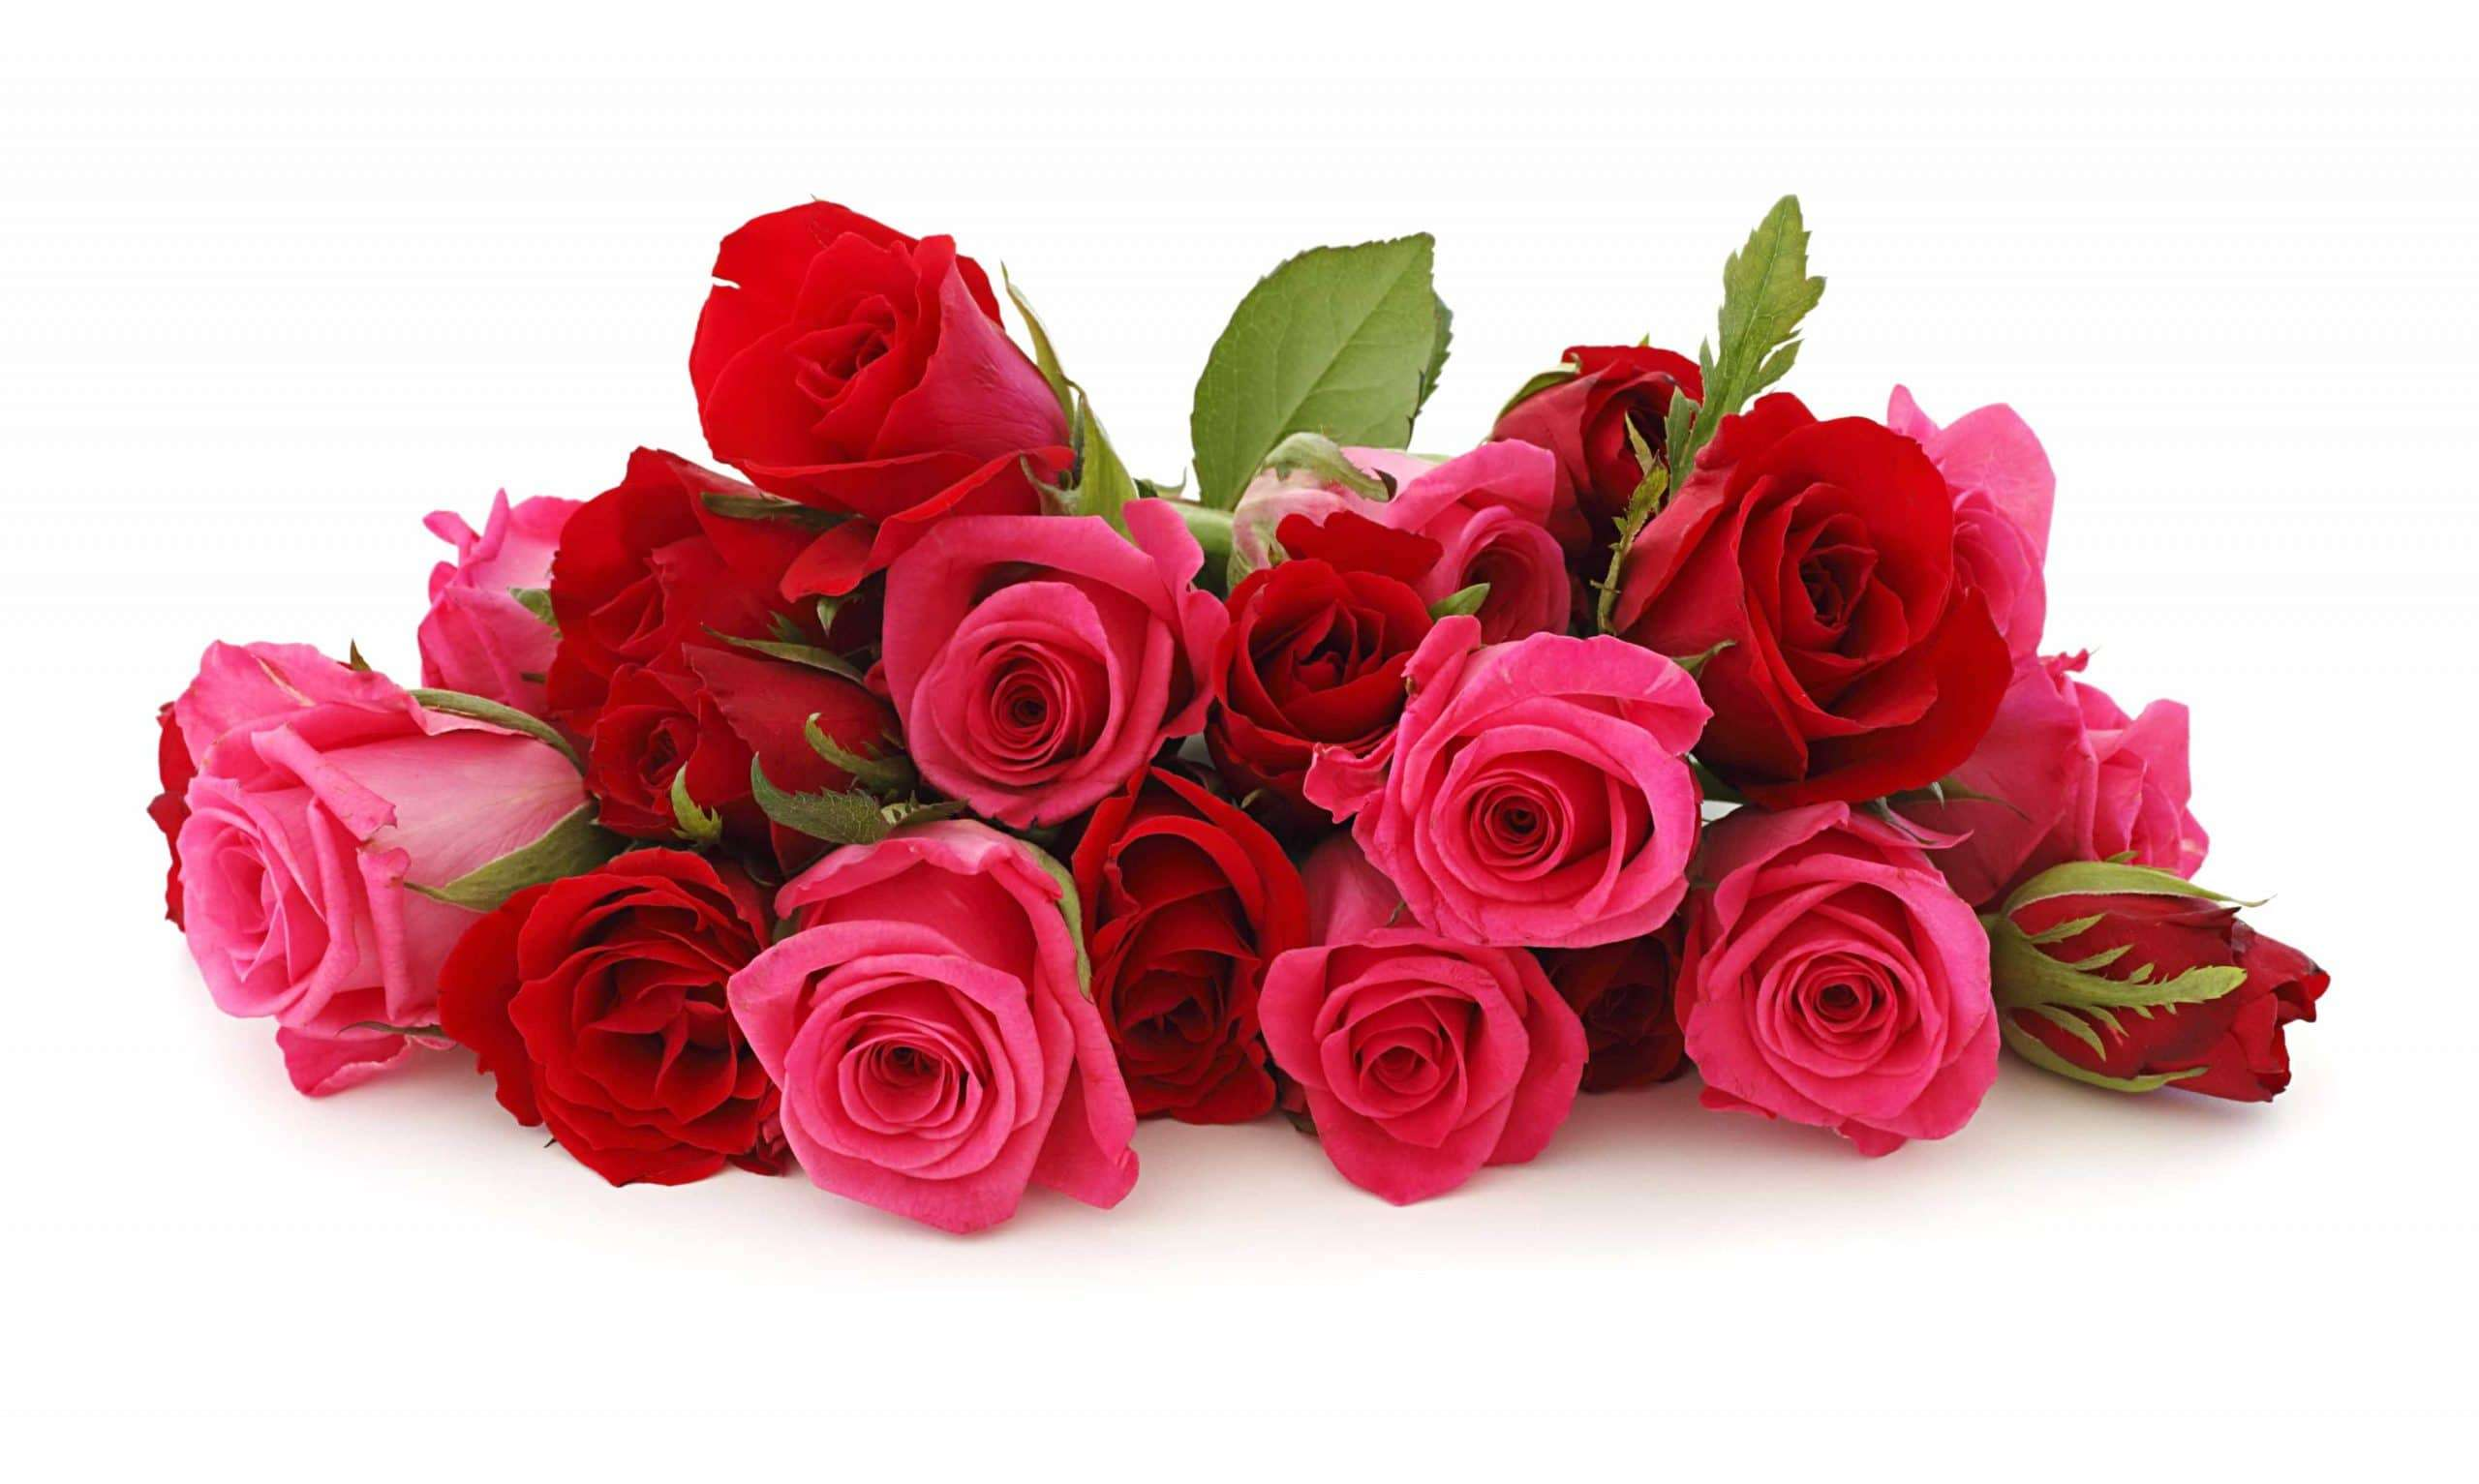 sfondi rose rosse